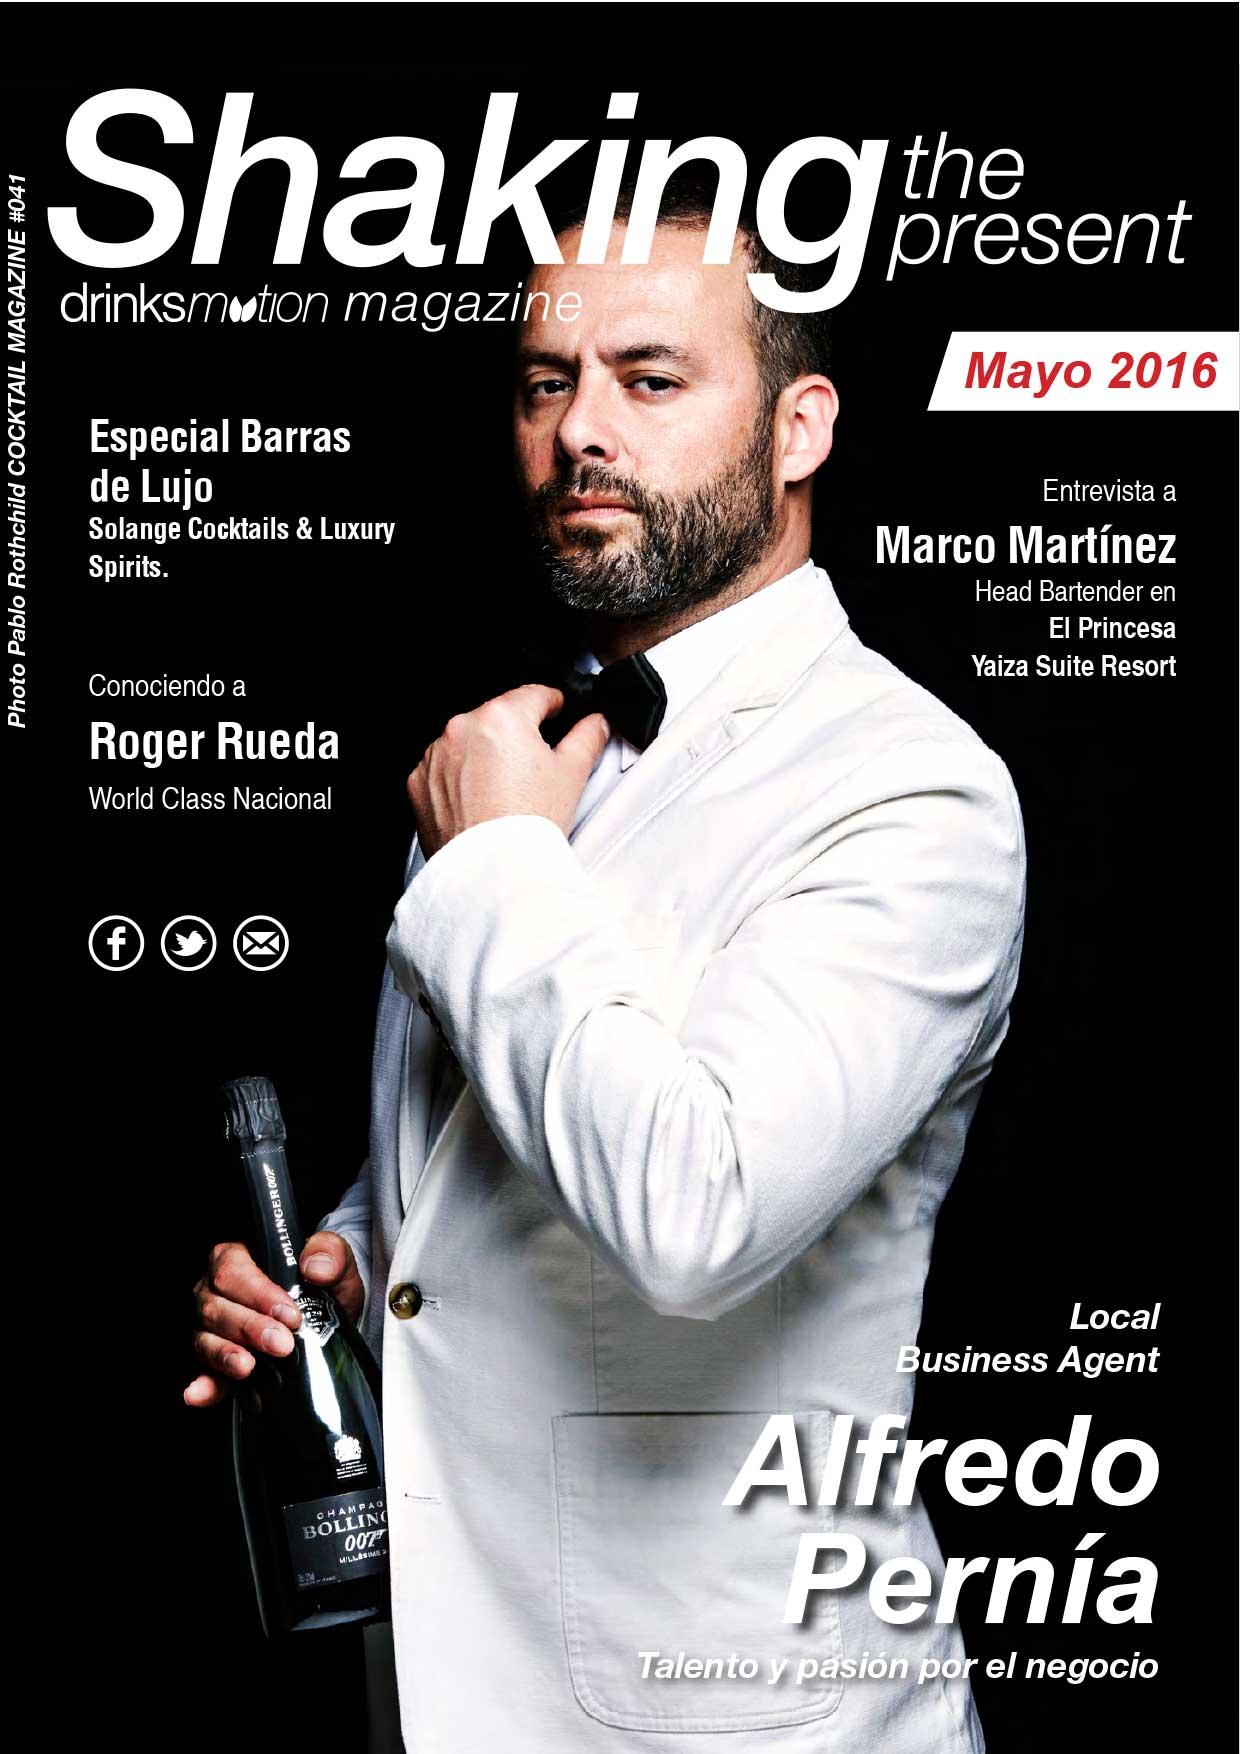 Magazine #30 Mayo 2016 – Alfredo Pernía